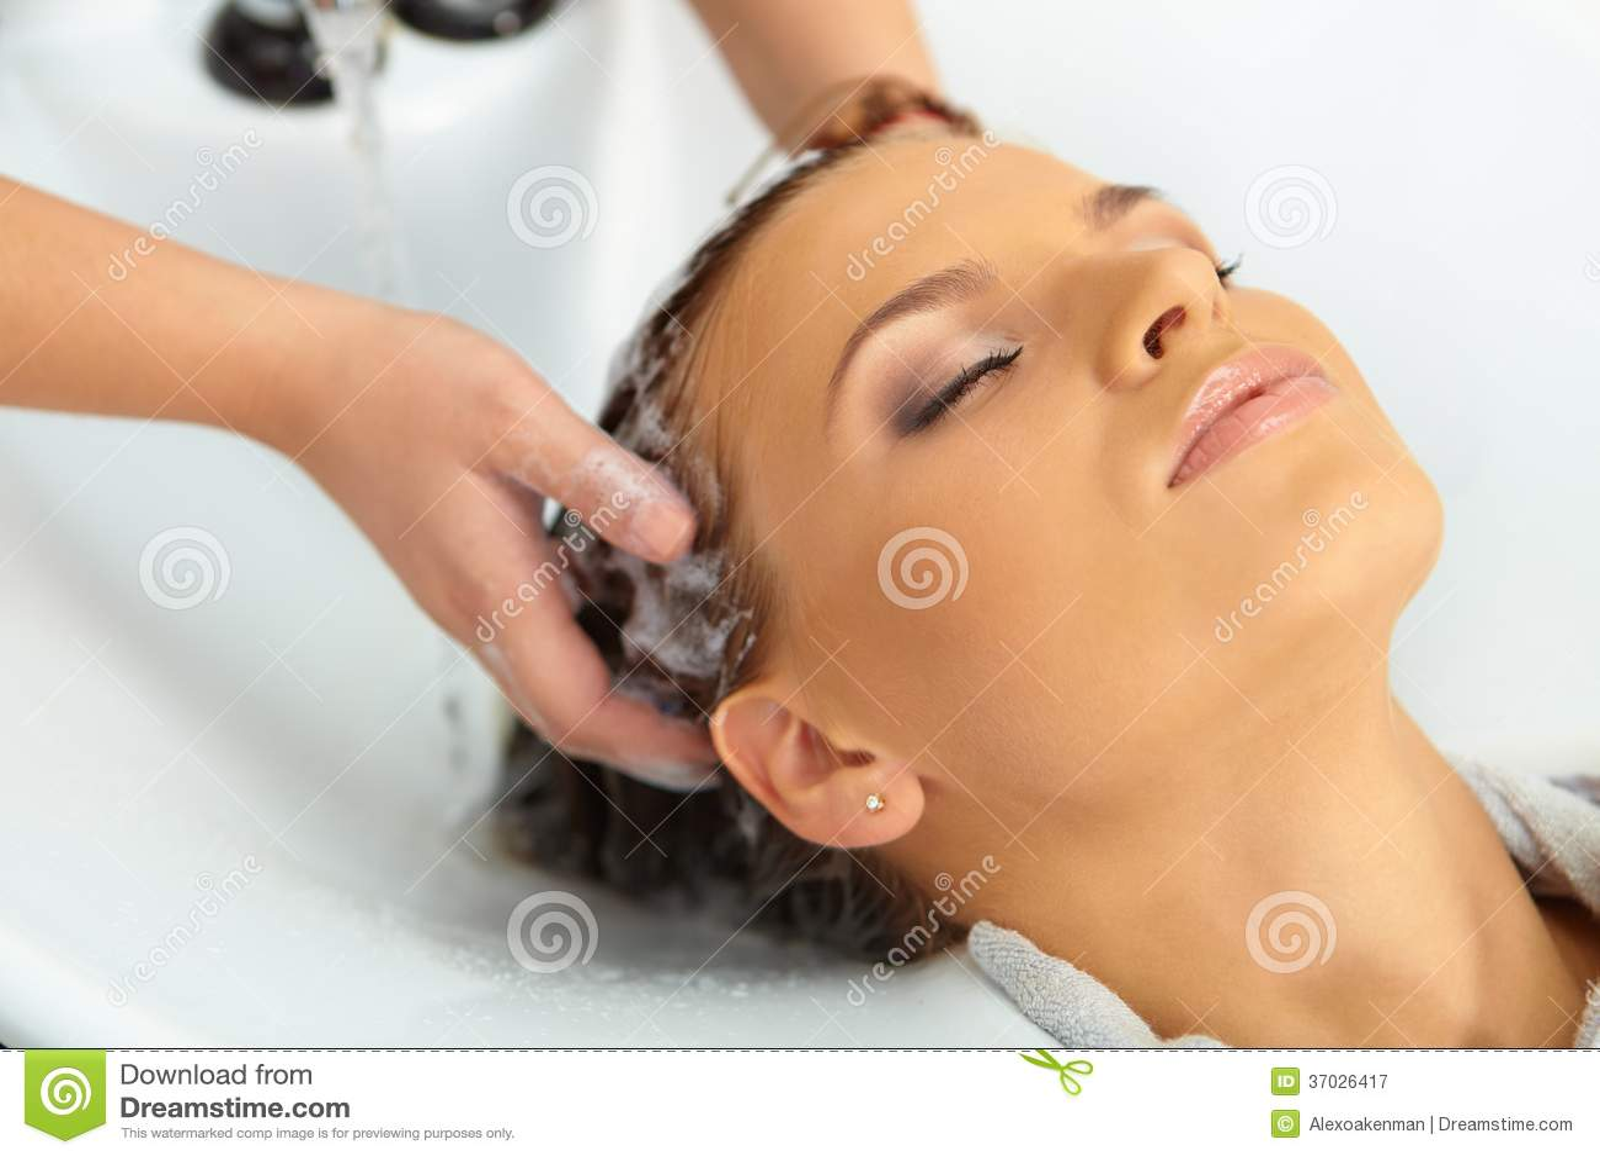 Hair salon washing with shampoo royalty free stock for Wash hair salon